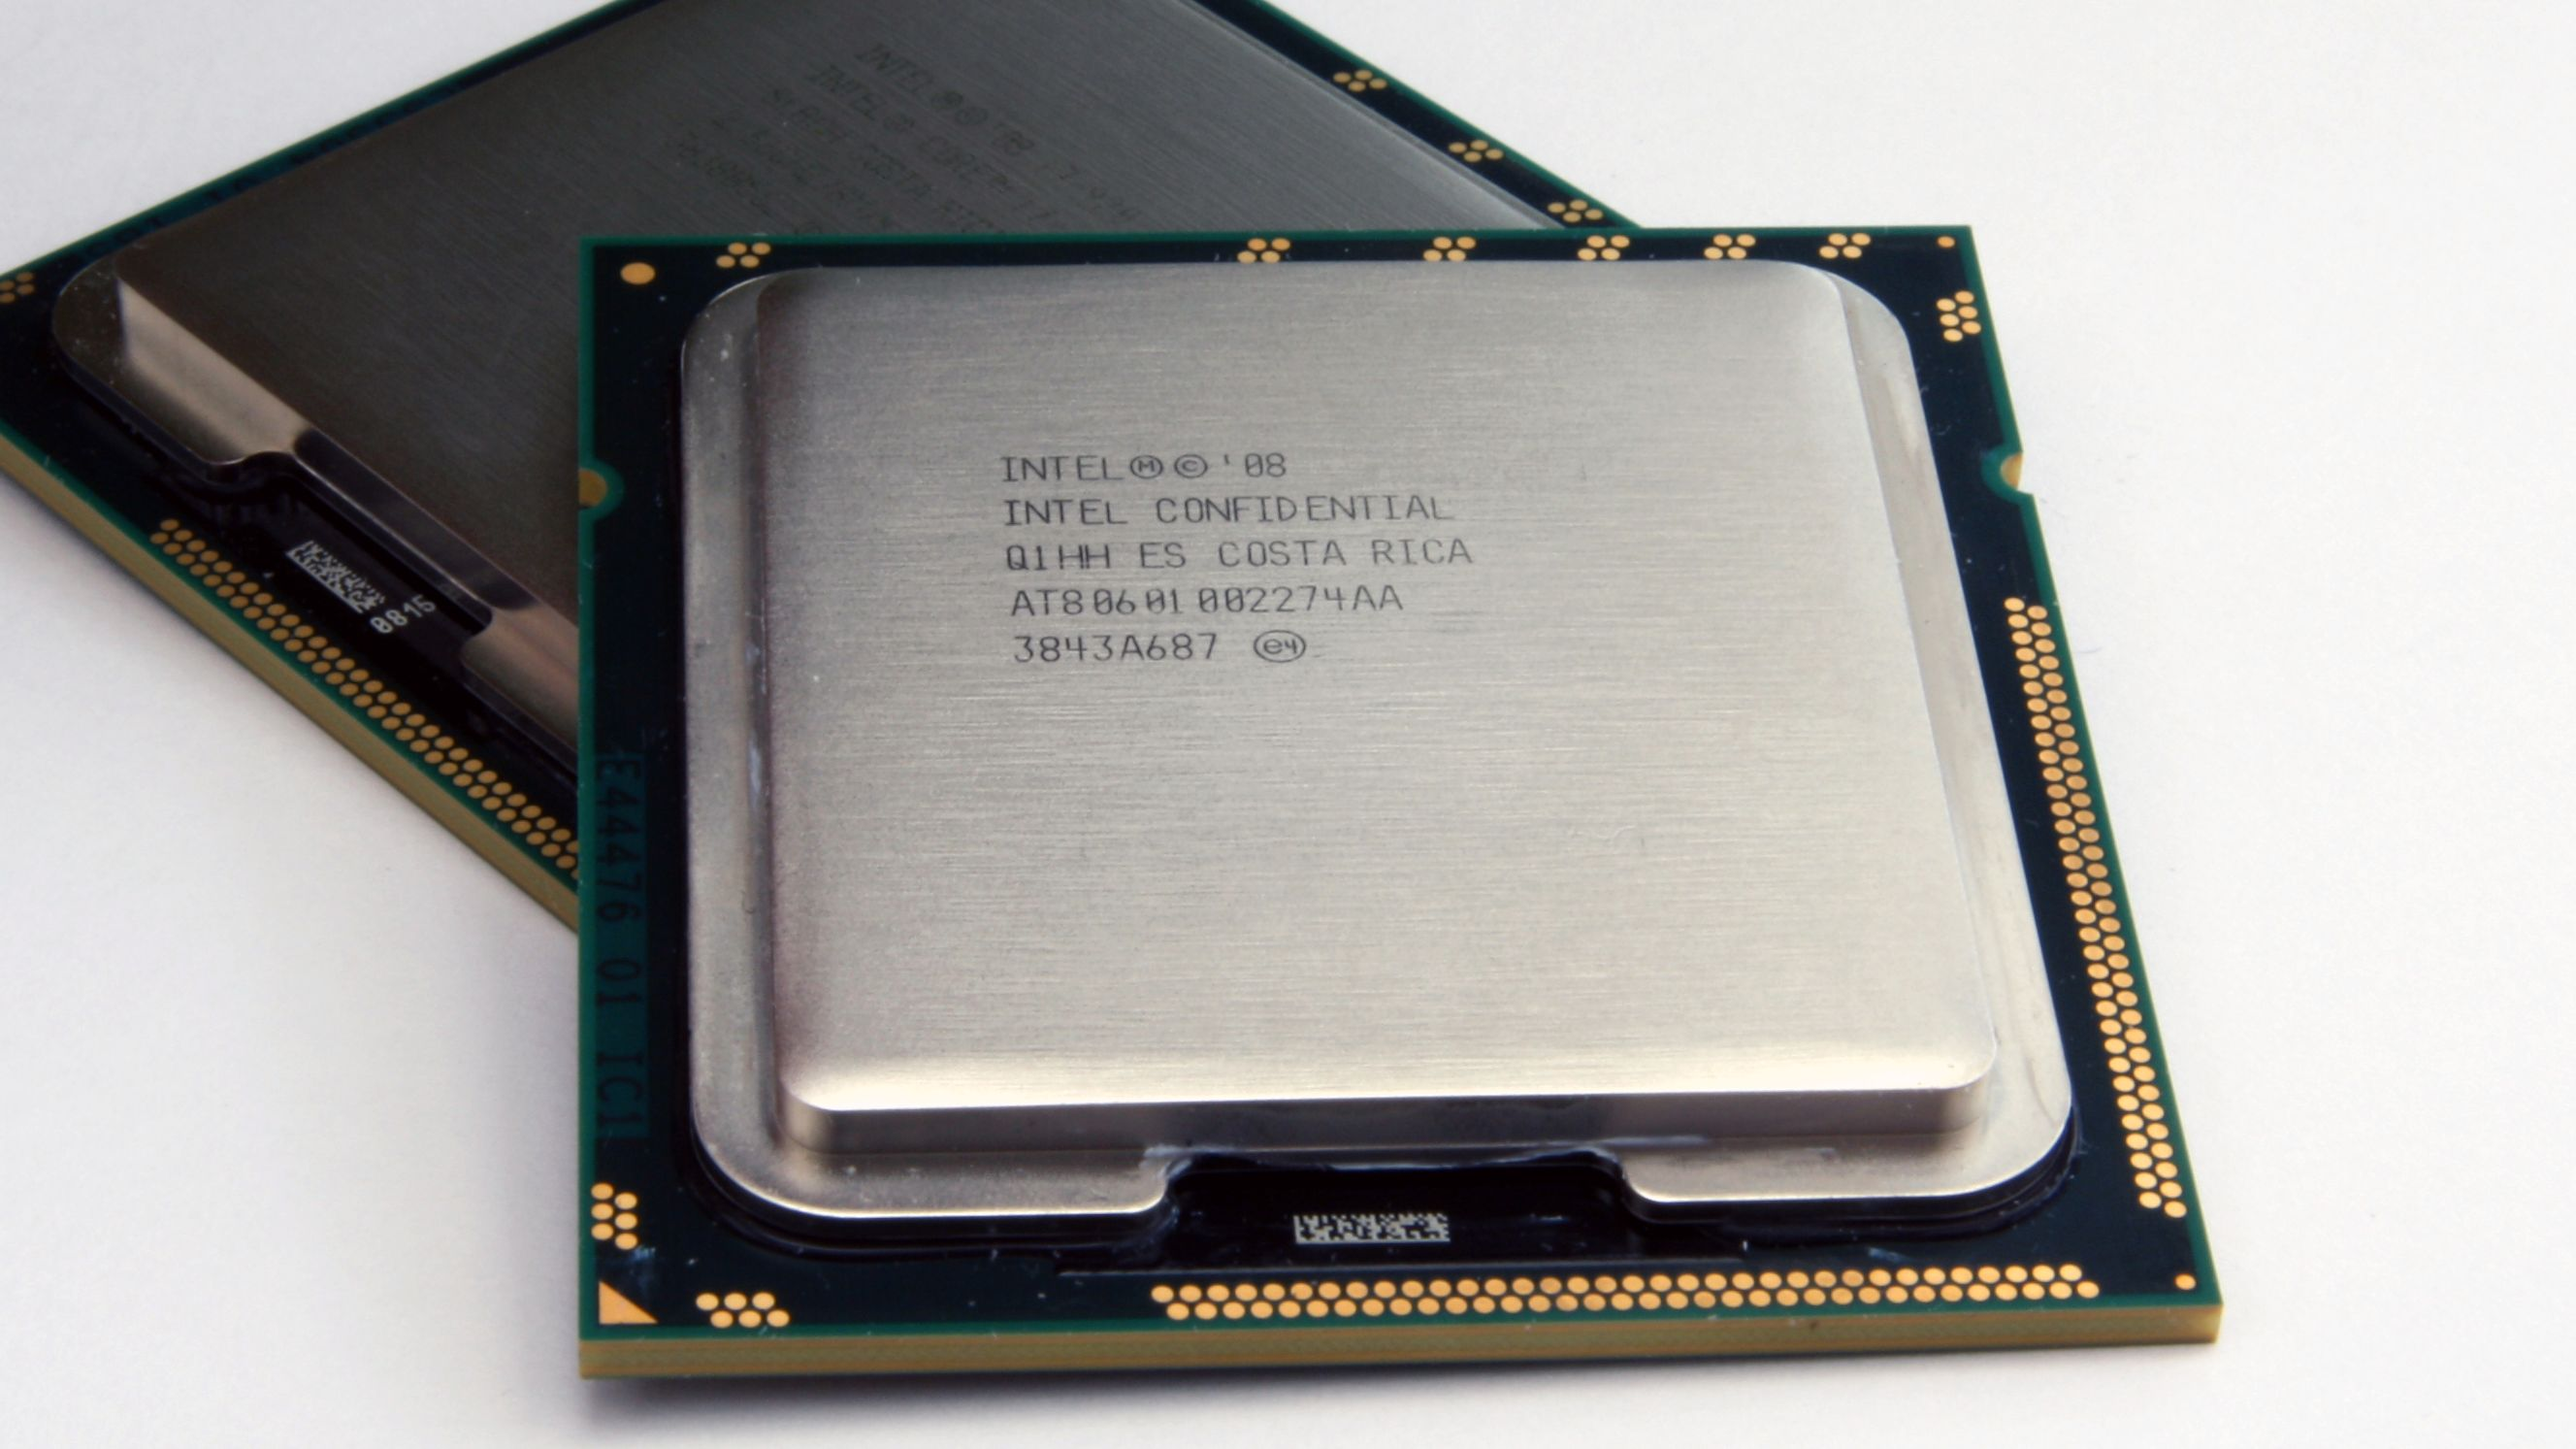 Intel i7 975 Extreme Edition